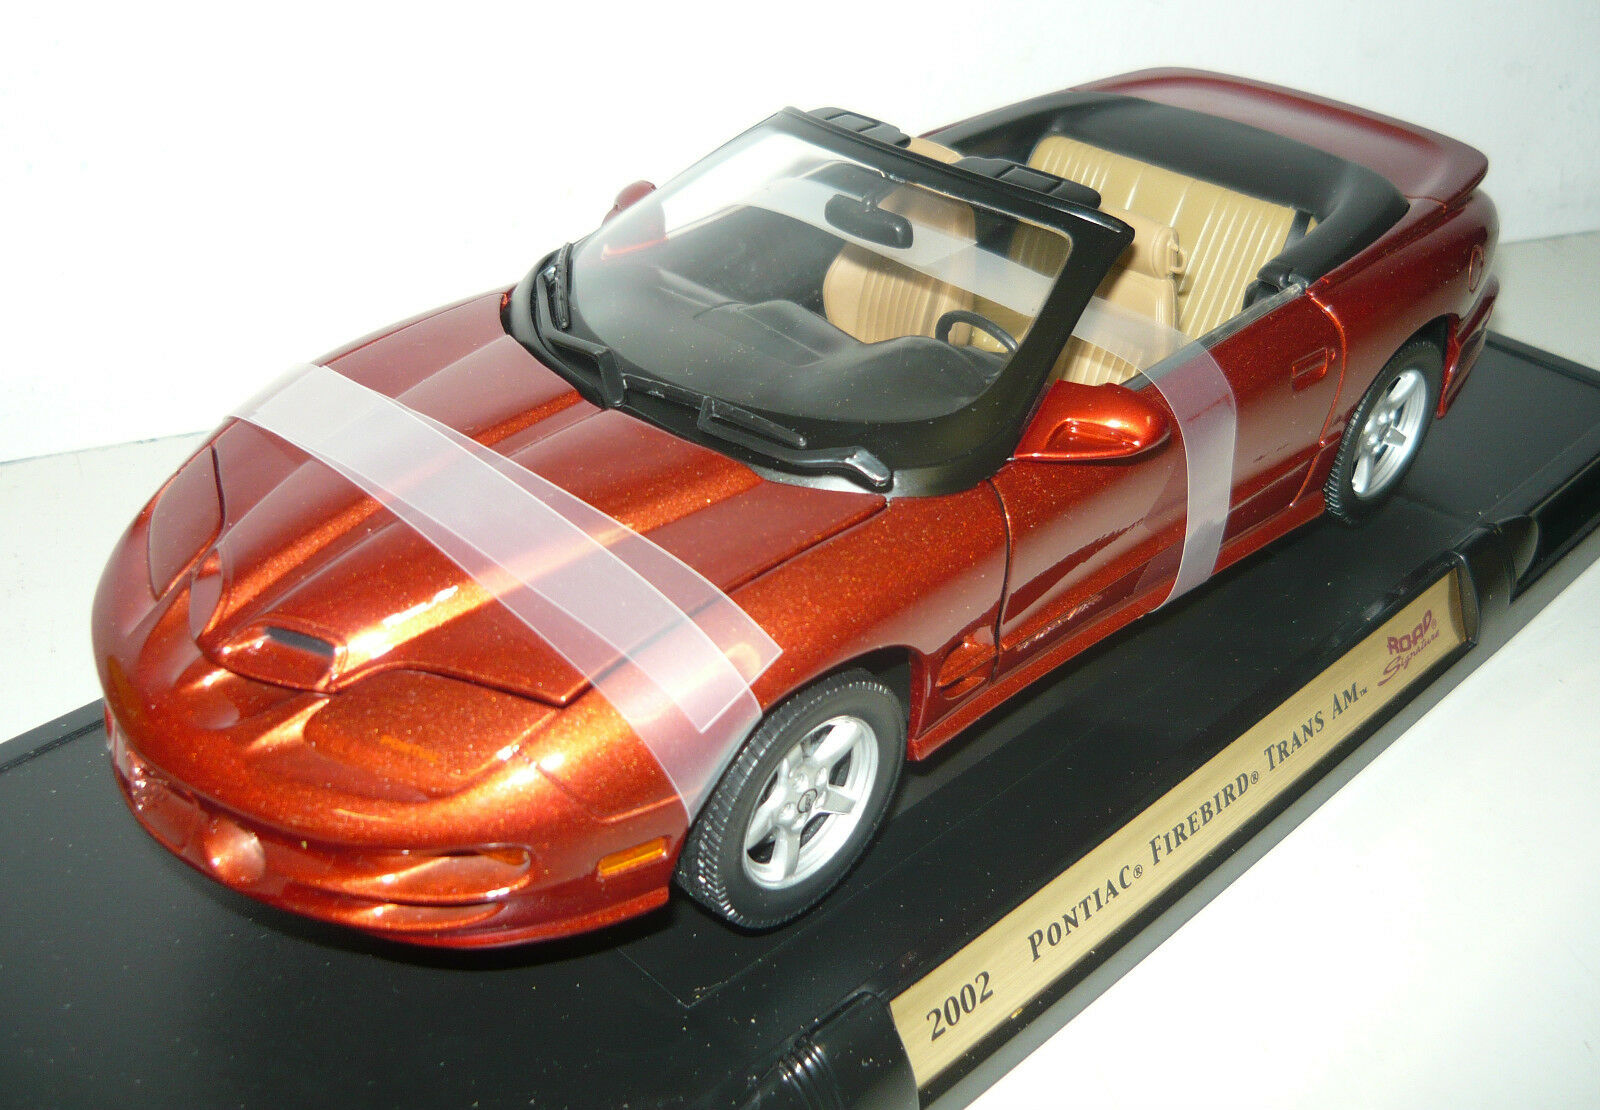 Yat ming 92389 2002 Pontiac Firebird Trans Am, Cobre metalizado, 1 18, neu&ovp